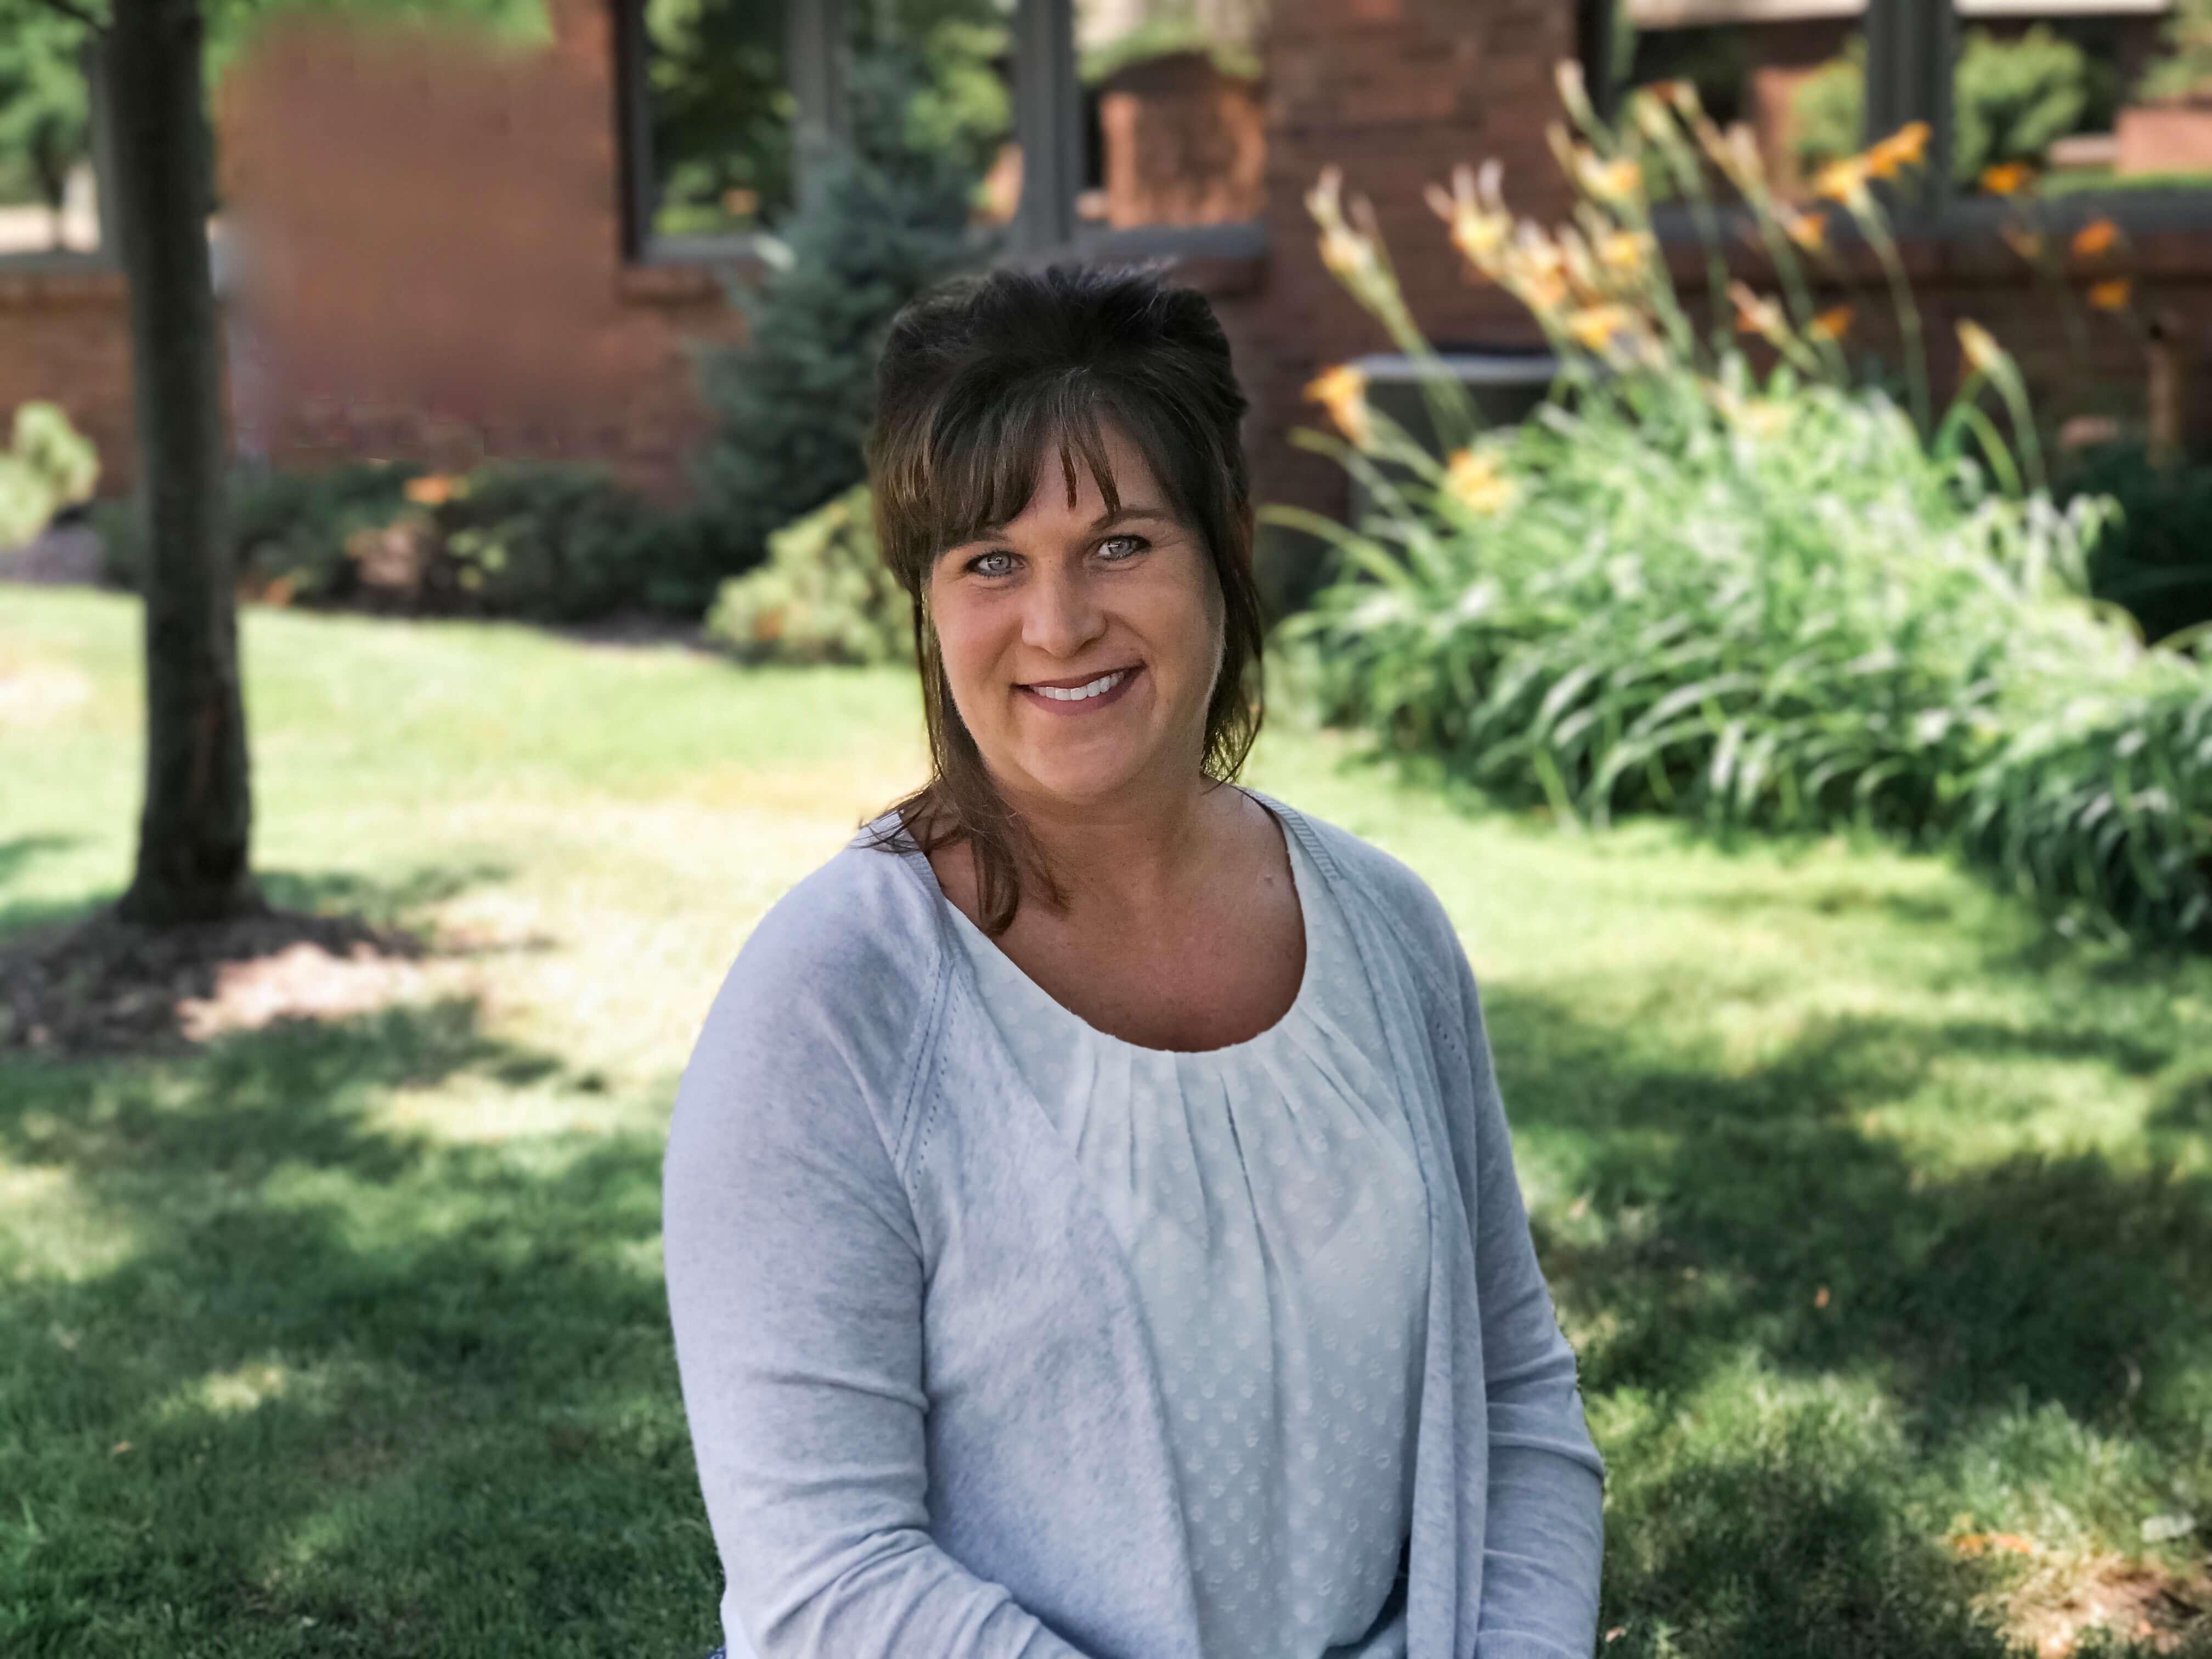 Cheryl _Weaver Dentistry 2018 2